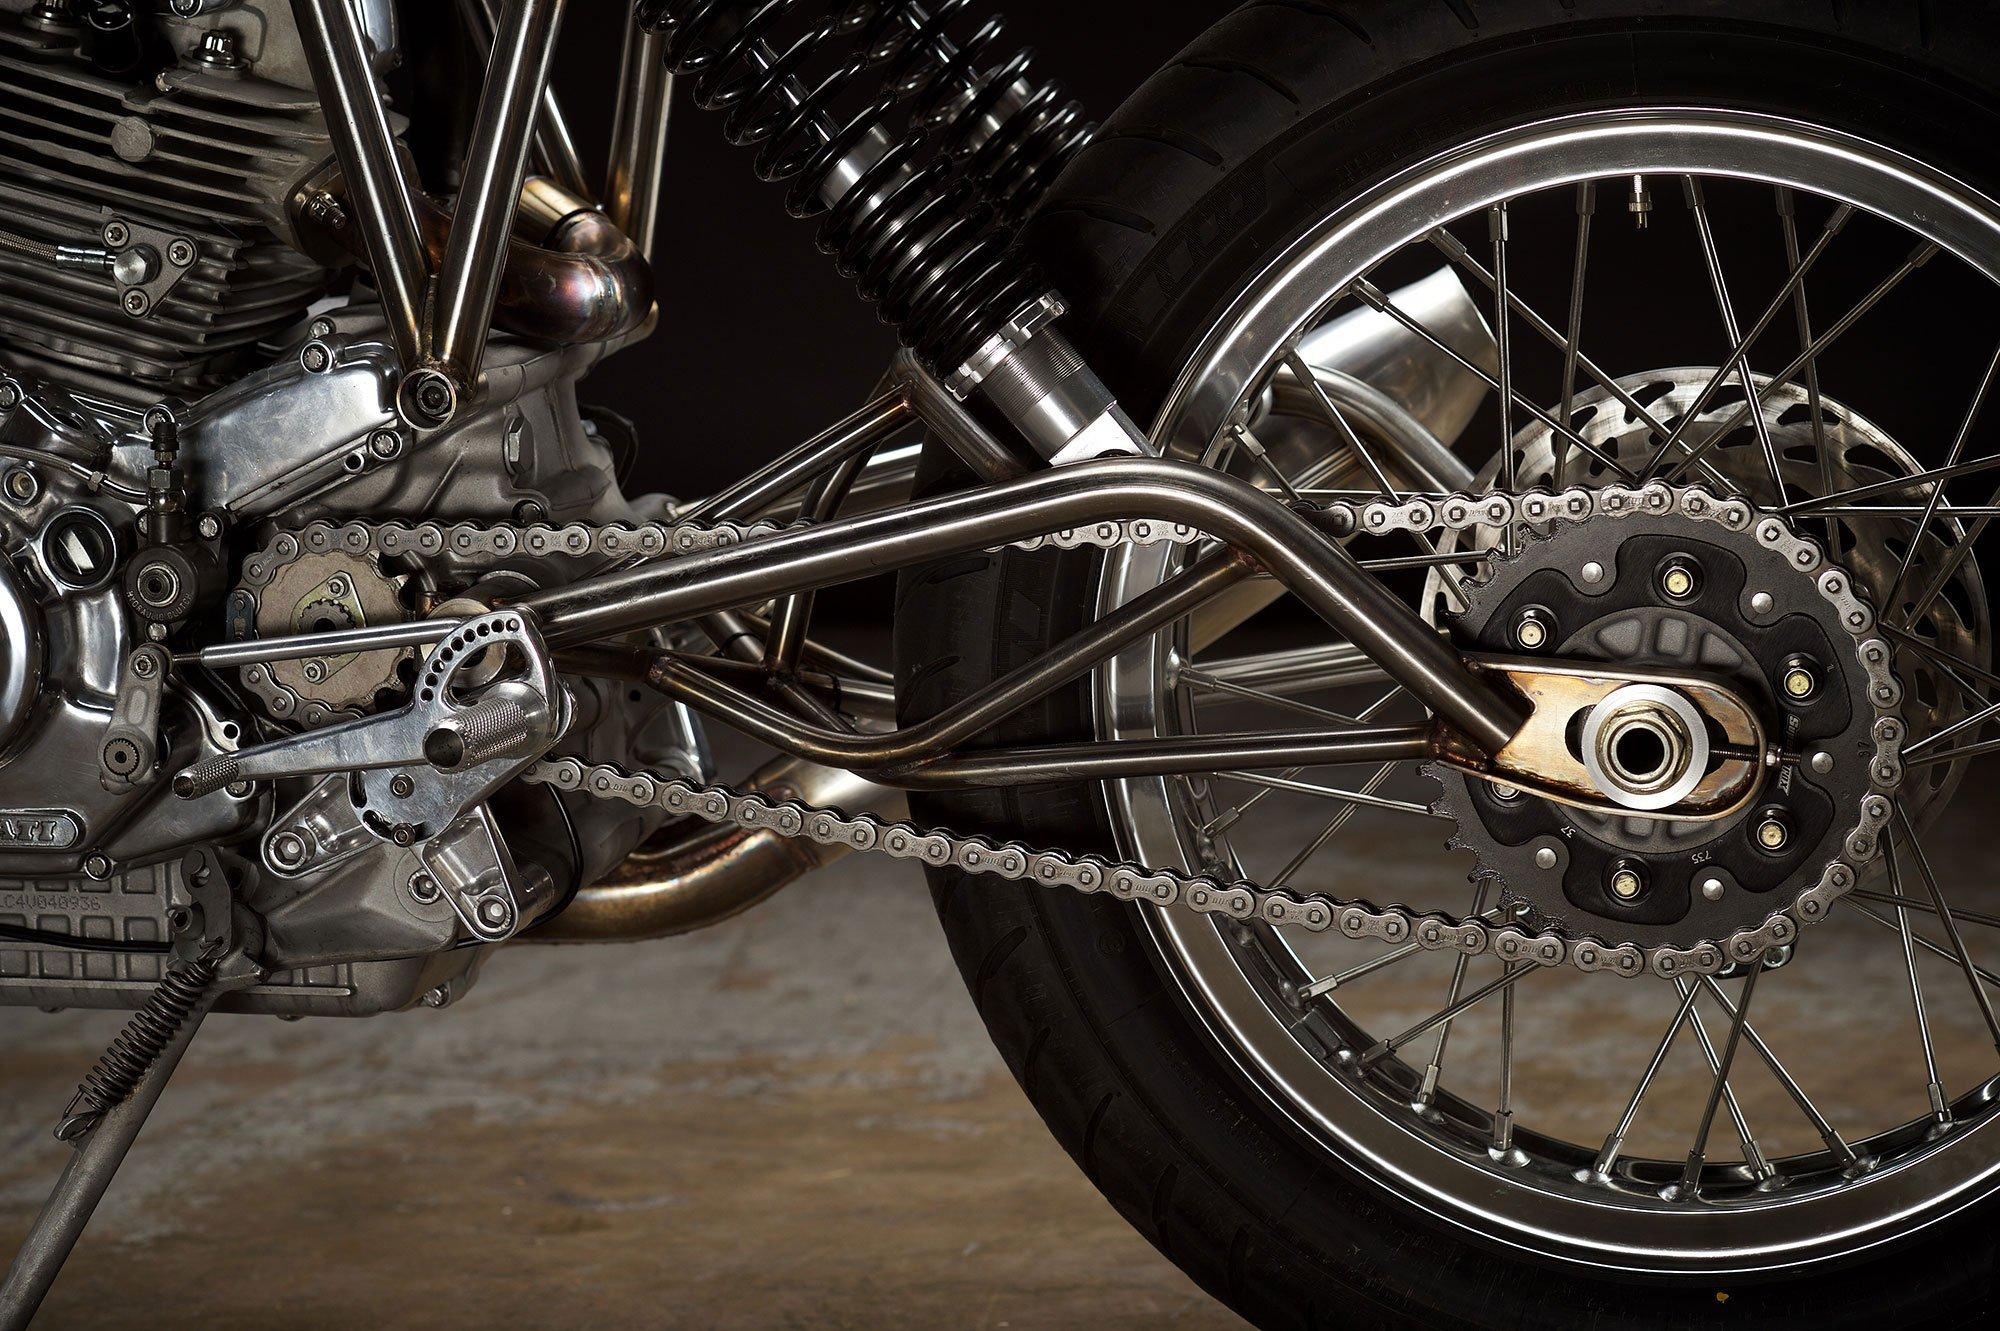 ducati-900ss-sp-j63-custom-build-by-revival-cycles-8